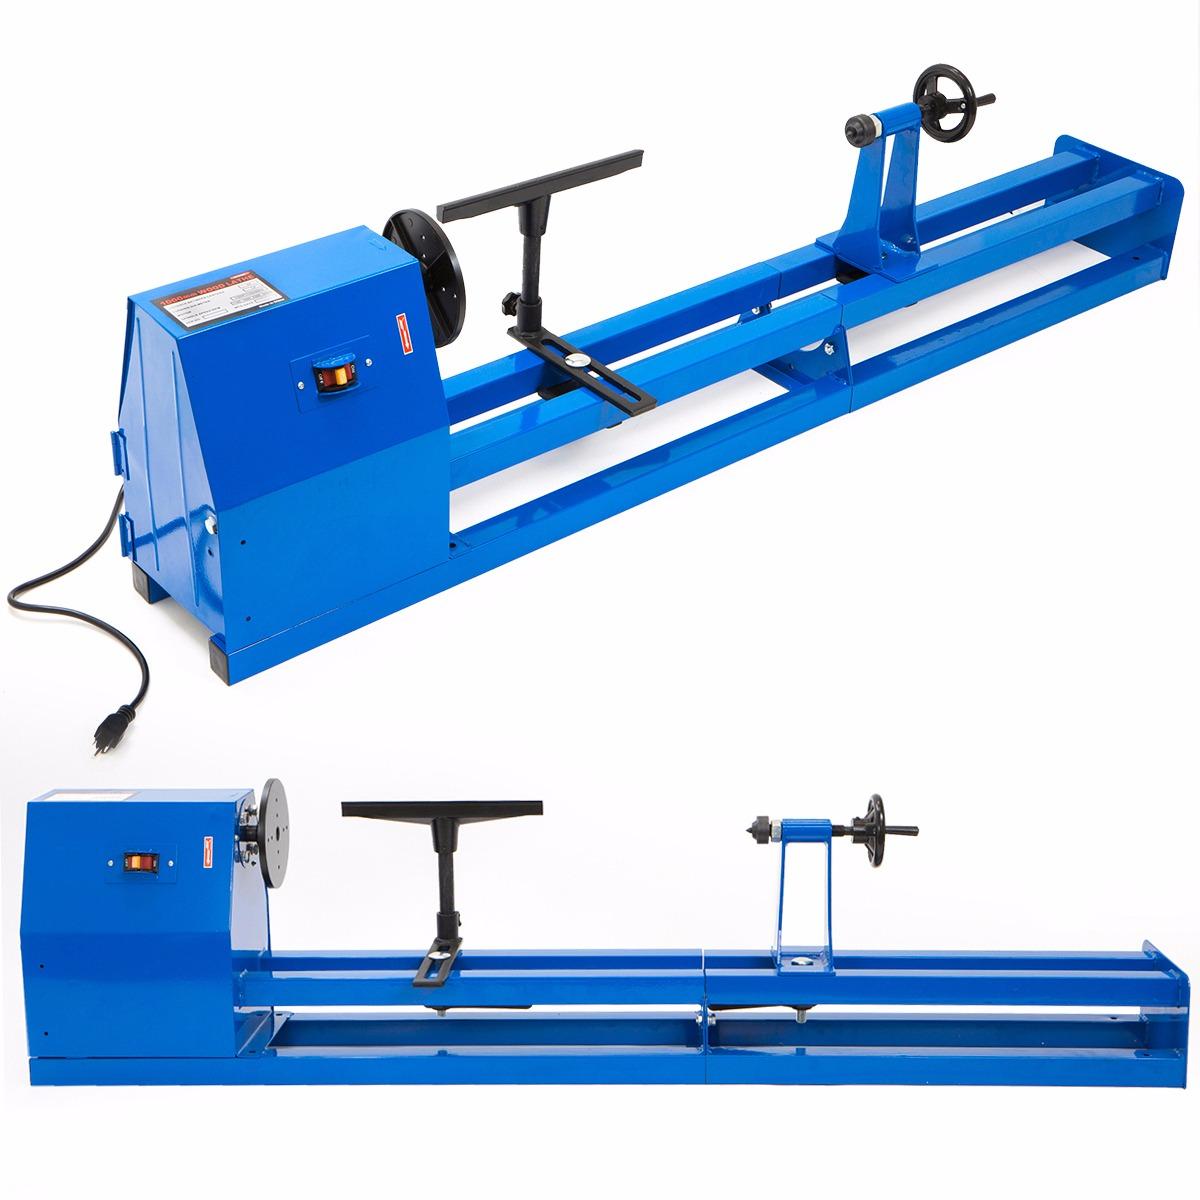 40 Inch 4 Speed 1 2 Hp 120v Wood Turning Lathe Machine 14 X 40